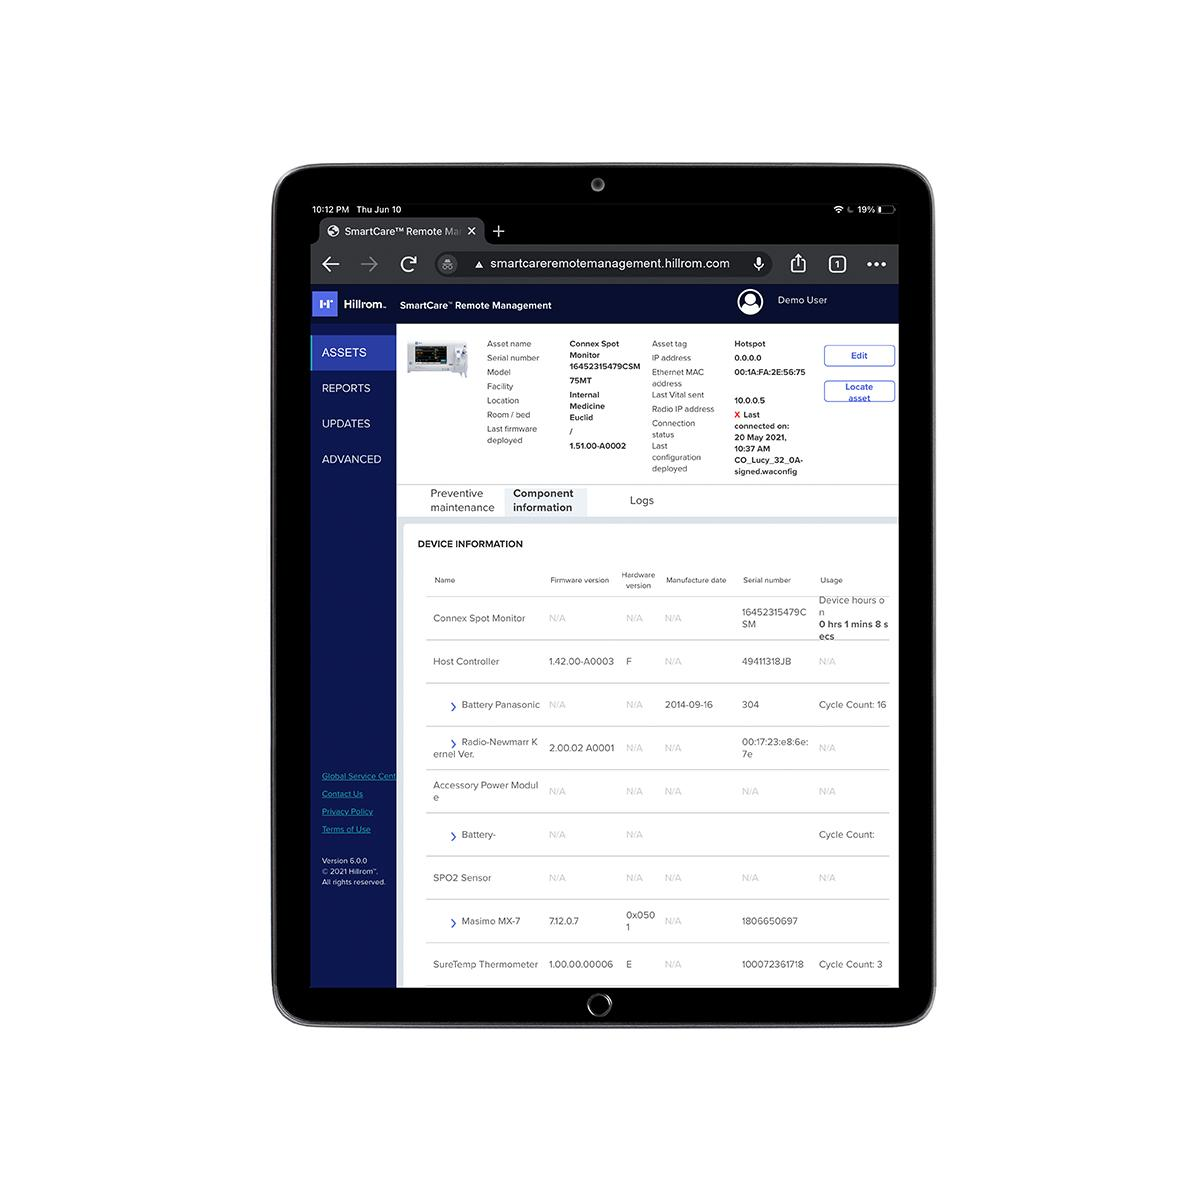 SmartCare™ Remote Management component information is displayed on a tablet.